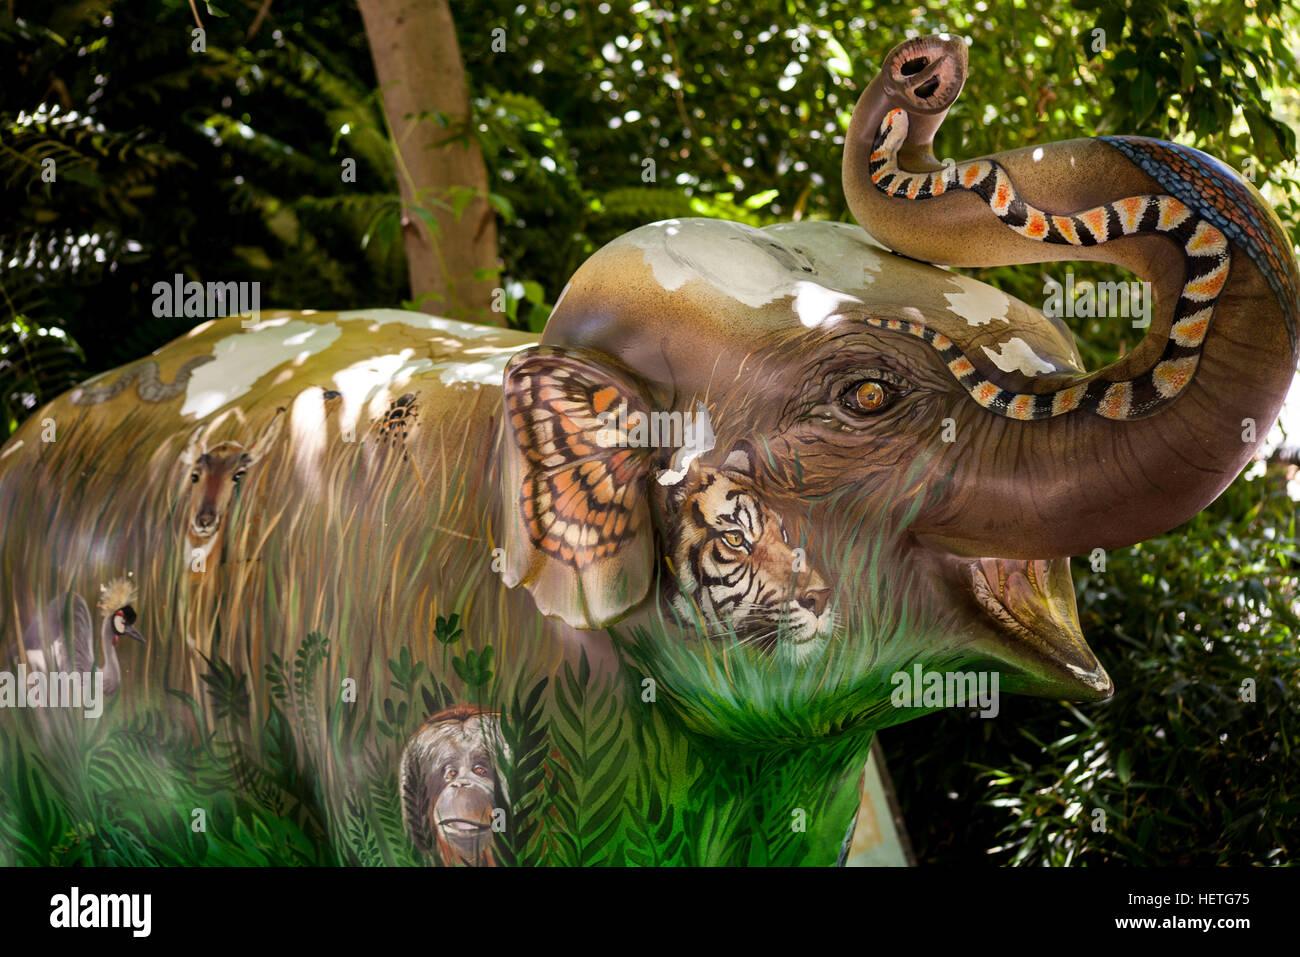 Los Angeles Zoo Stockfotos & Los Angeles Zoo Bilder Alamy